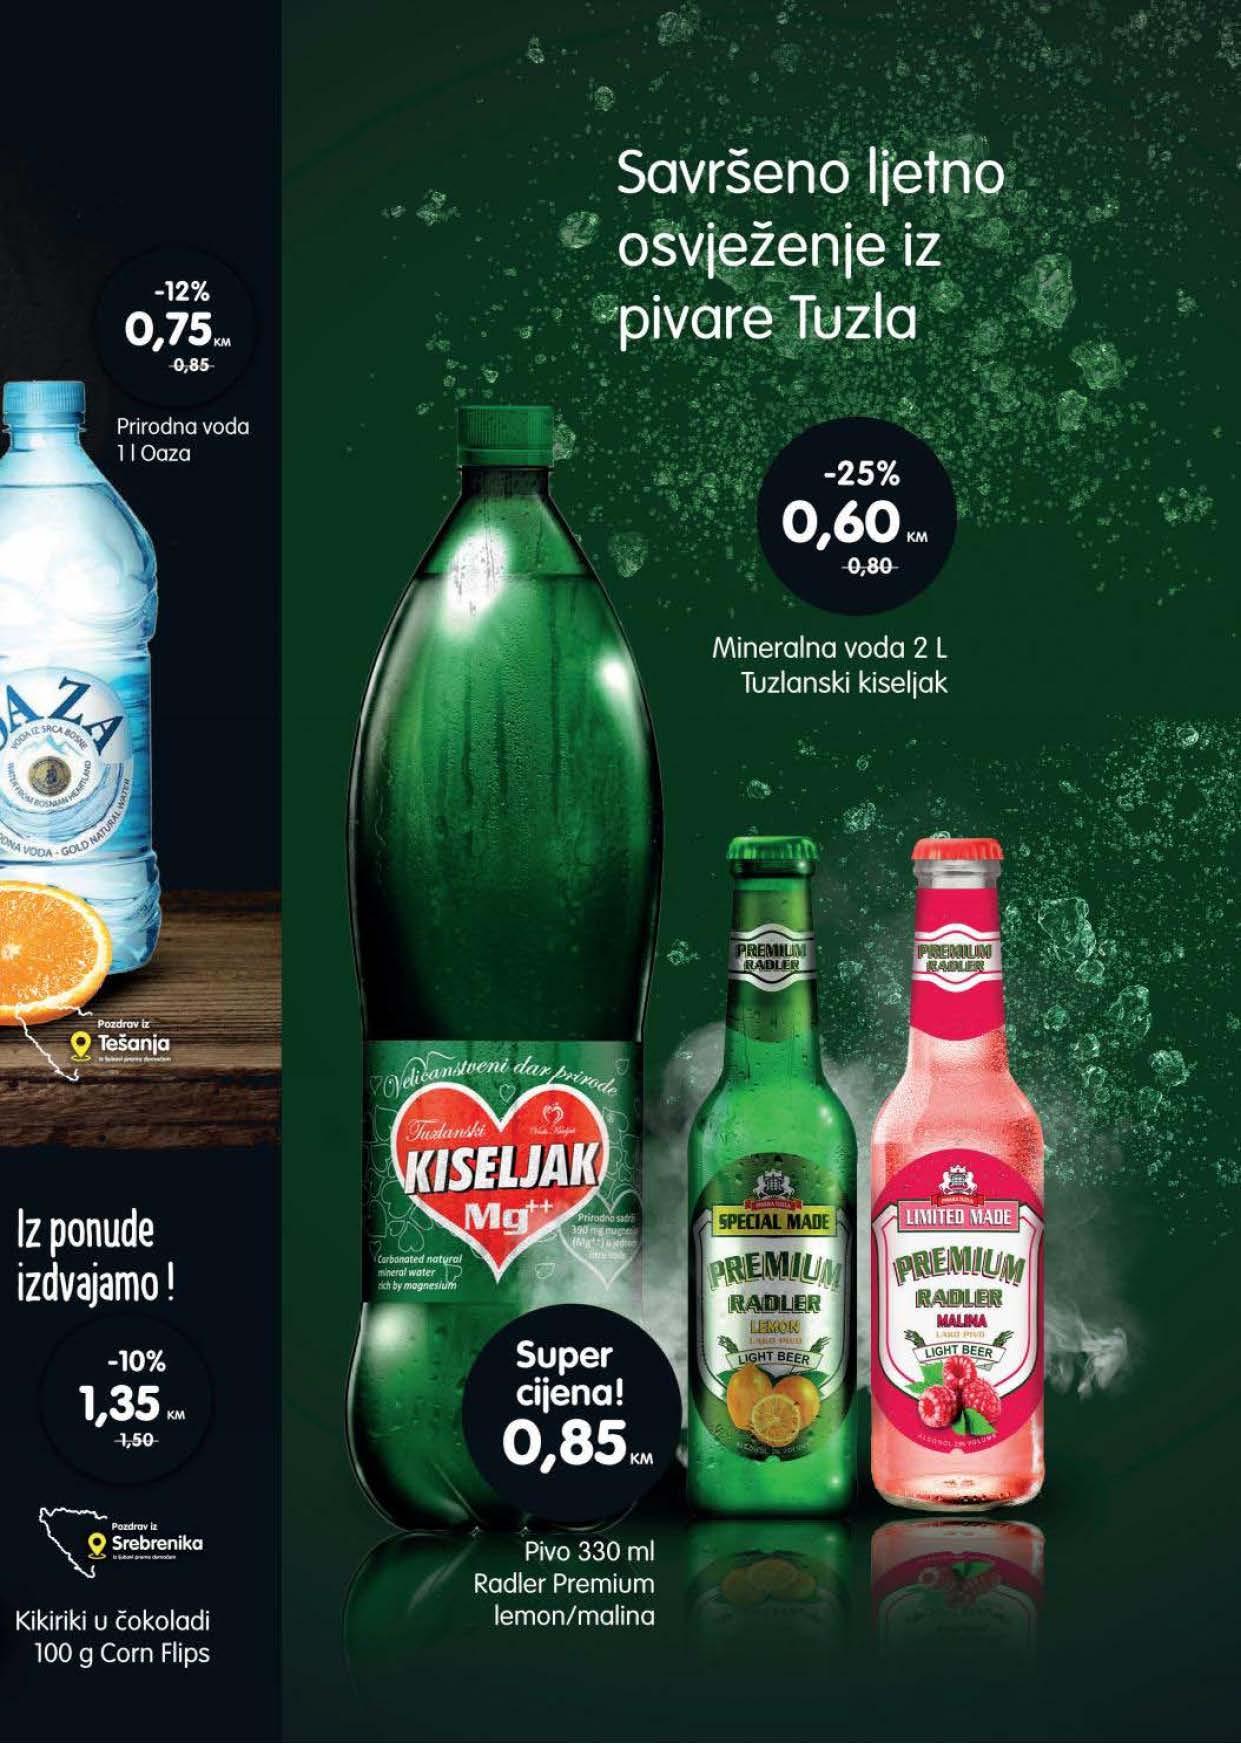 BINGO Katalog Kupuj pametno kupuj domace JUN JUL 2021 28.6.2021. 4.7.2021. Page 7